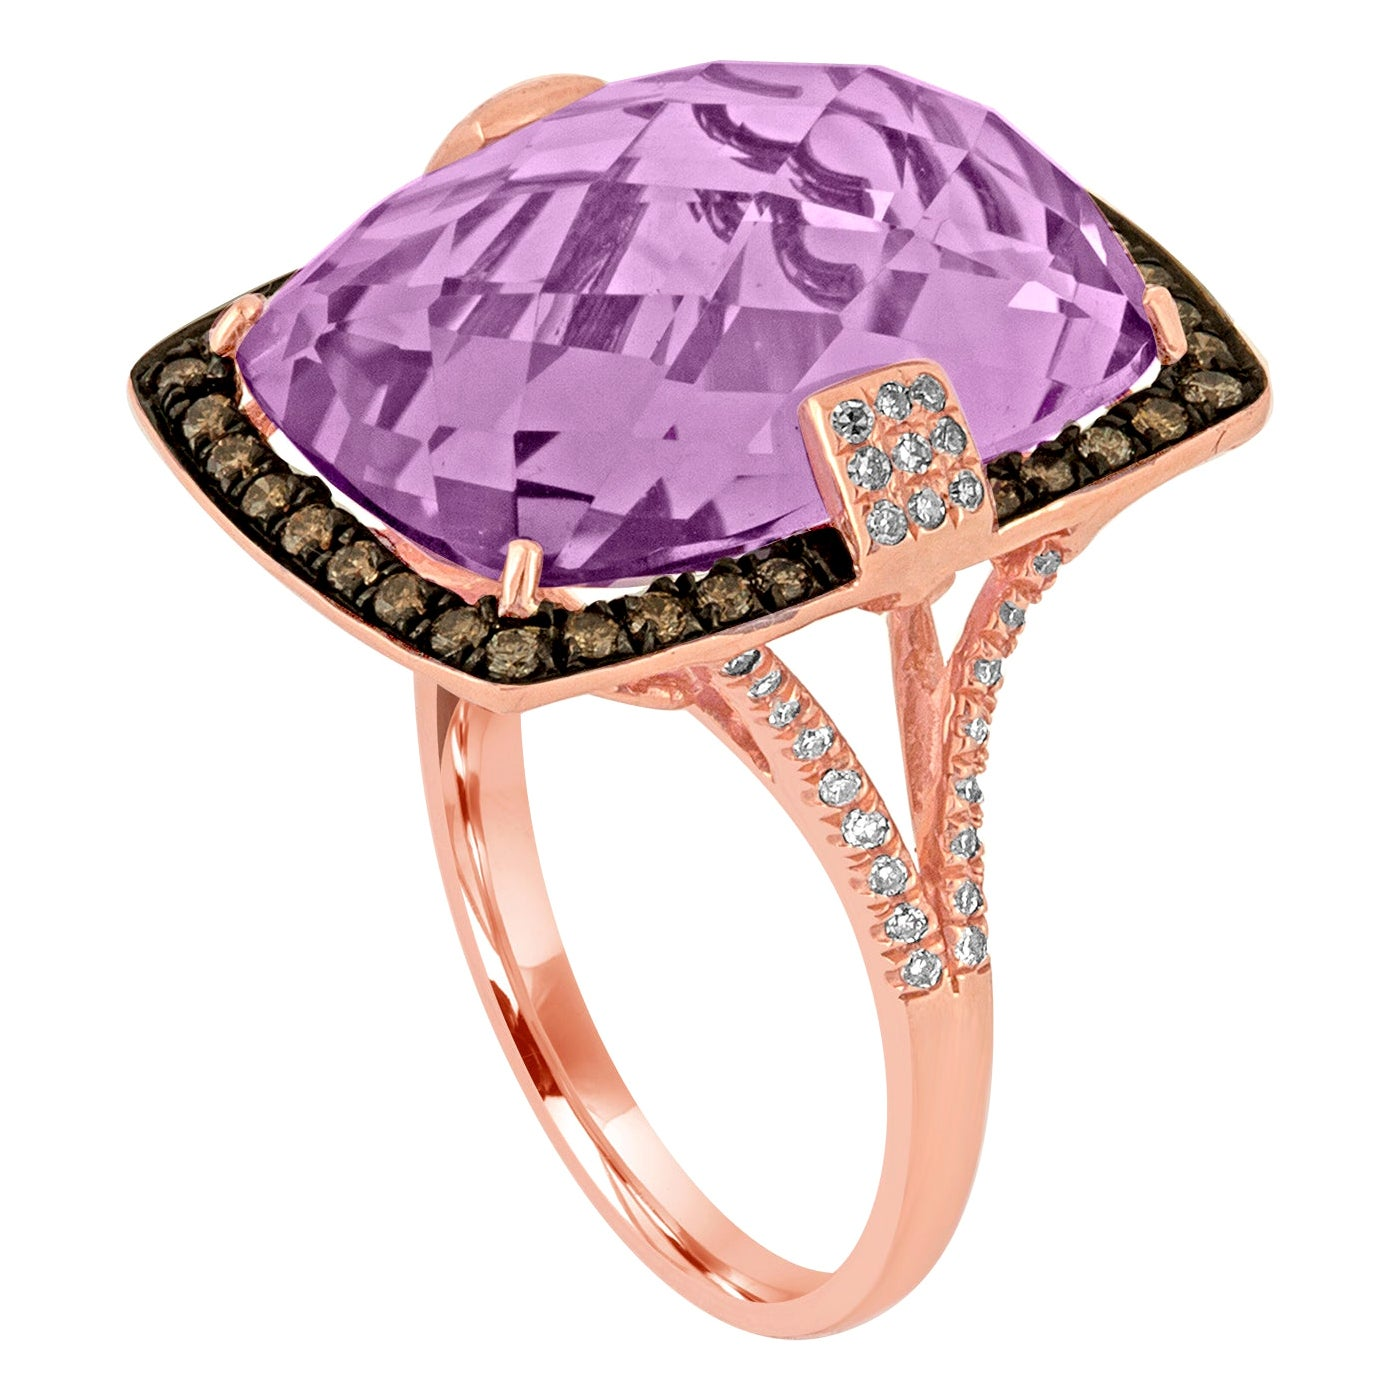 13.93 Carat Radiant Checkerboard Cut Amethyst Diamond Gold Ring